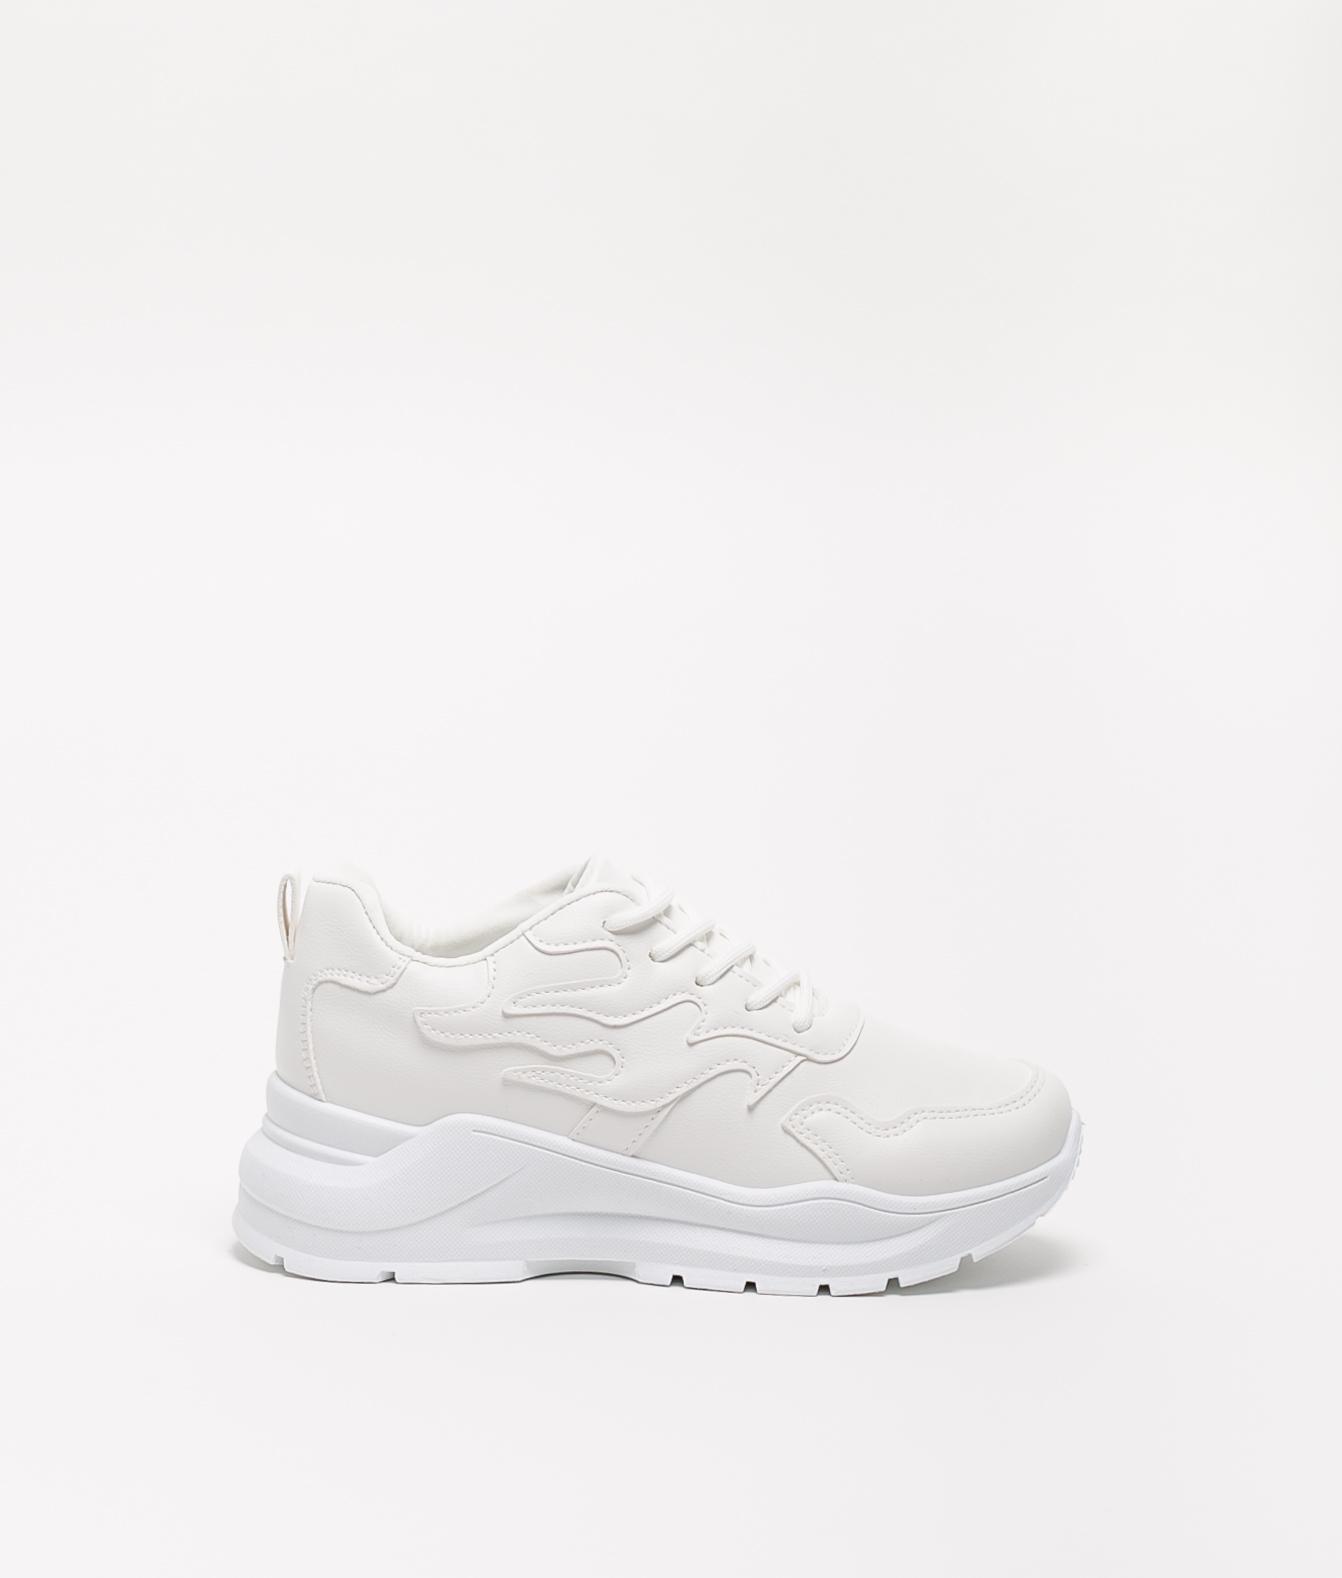 Sneakers Sunco - Bianco